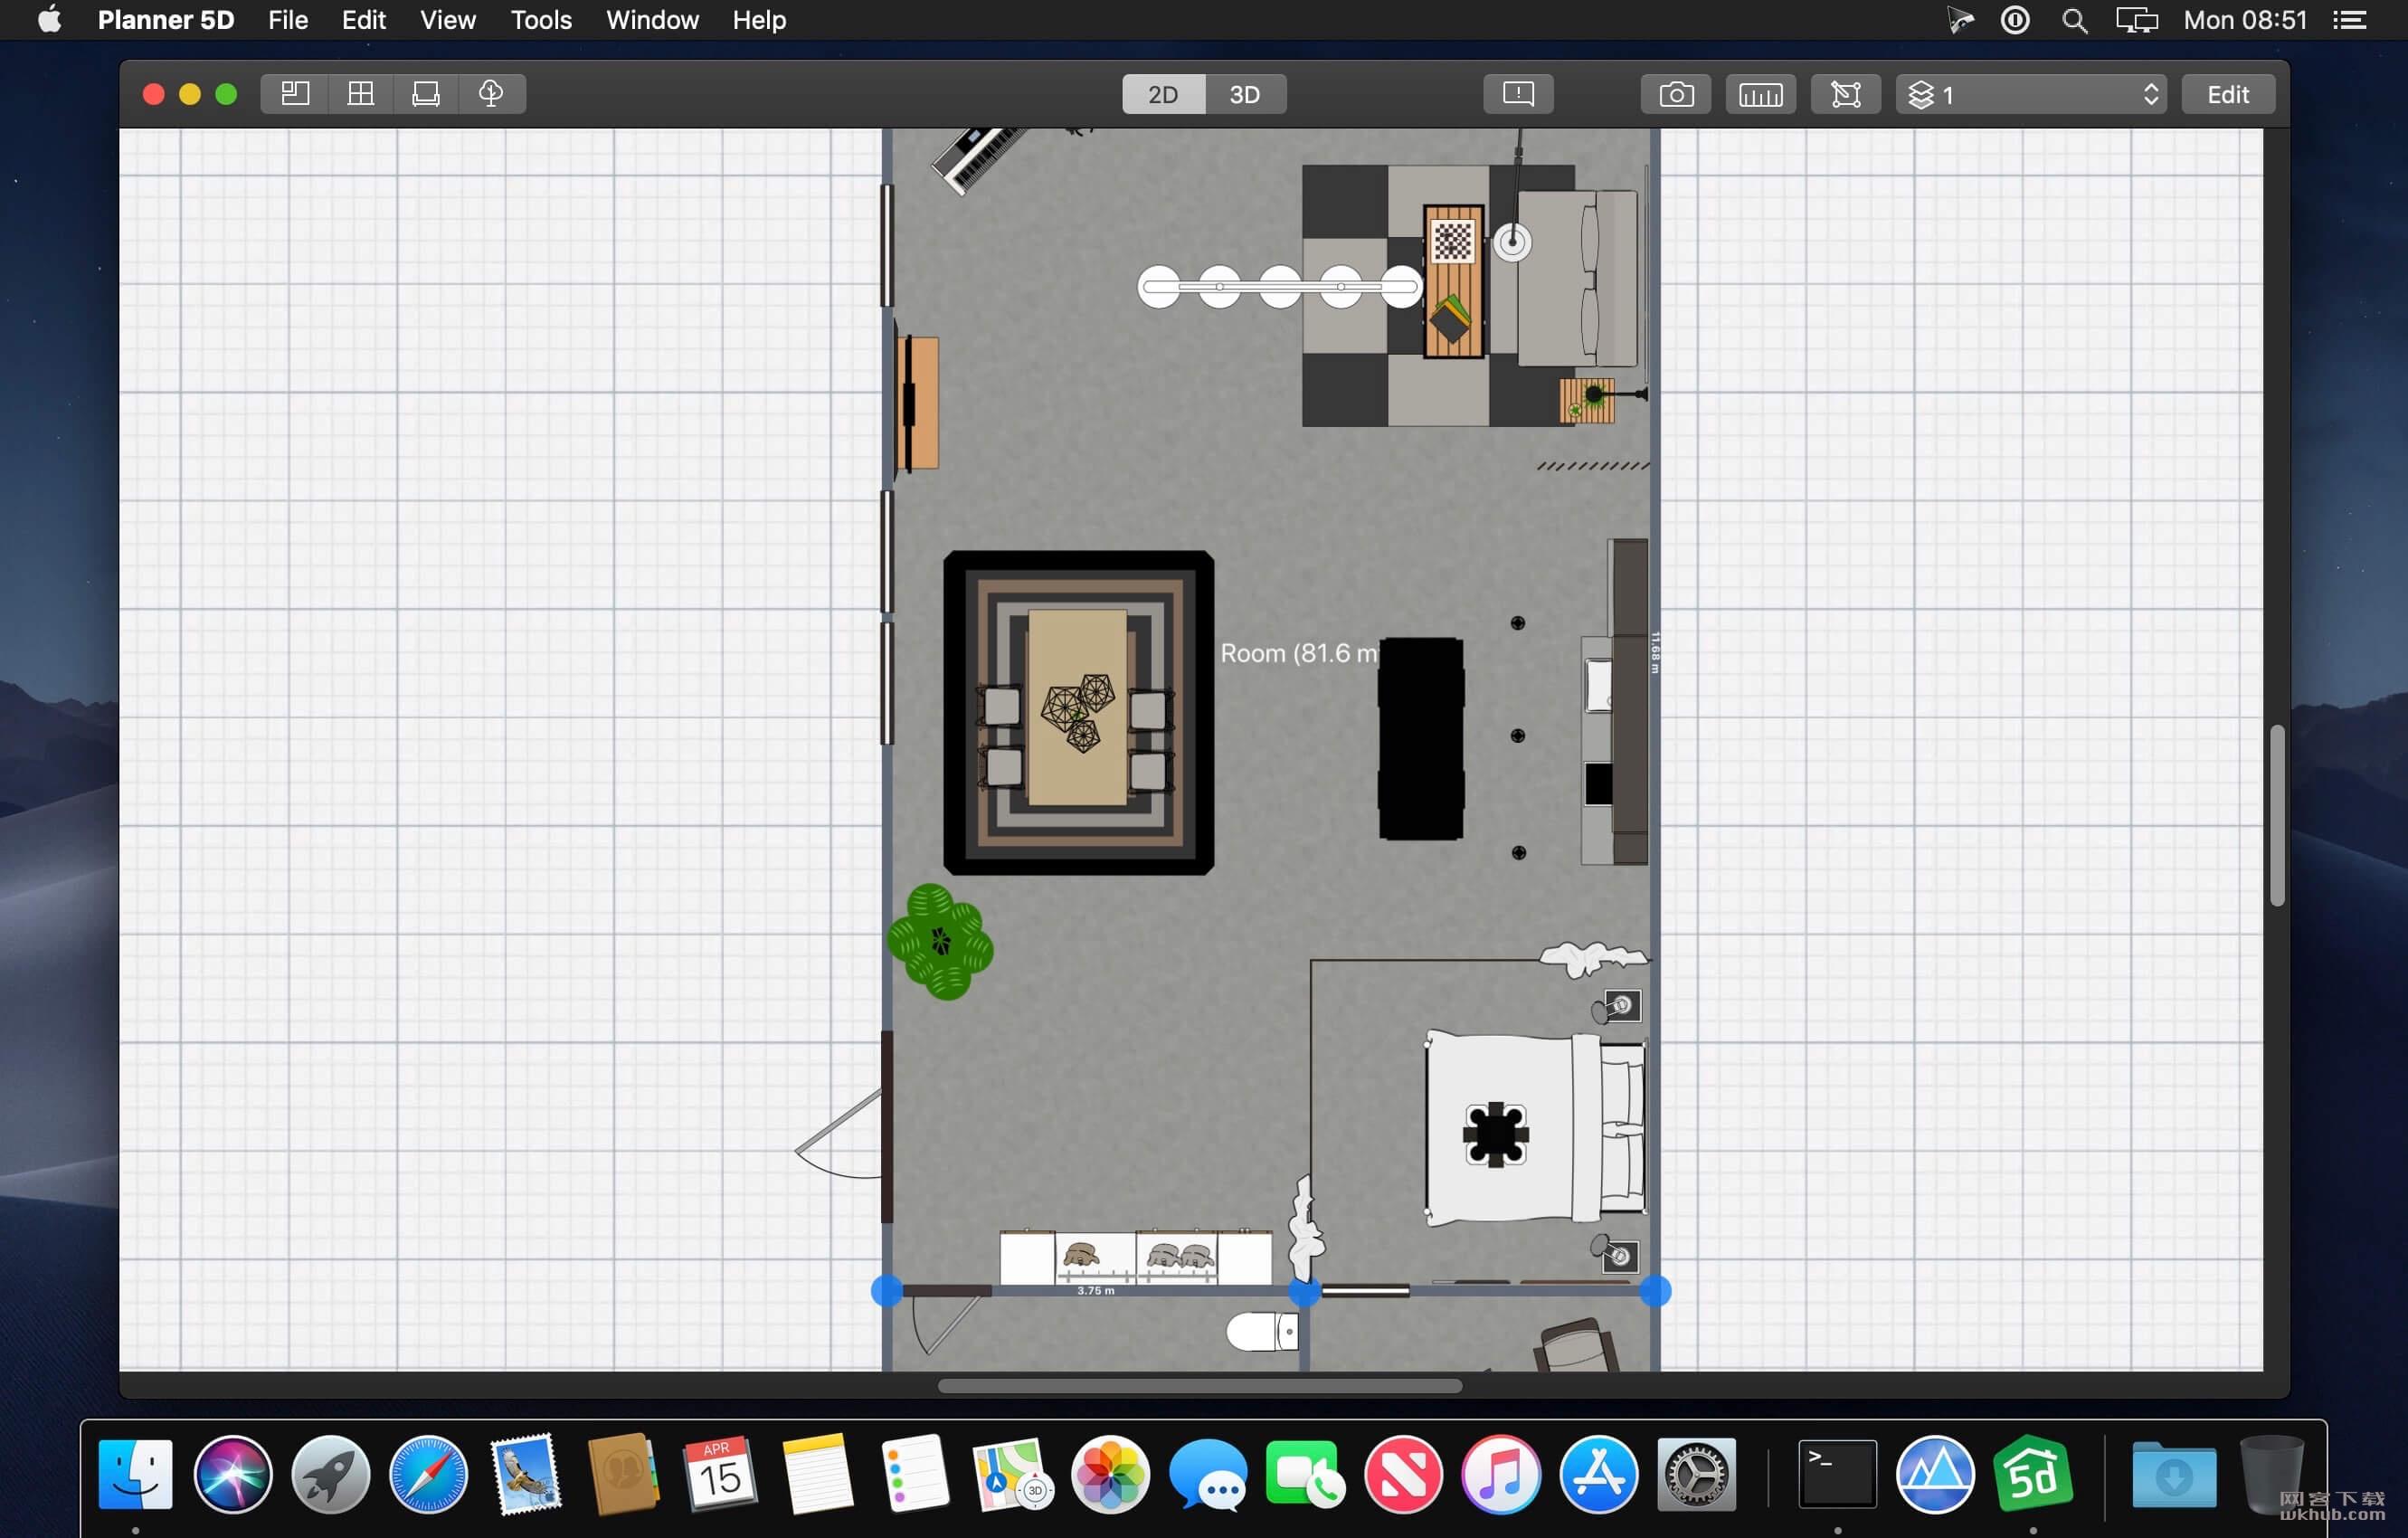 Planner 5D 4.2.27 室内设计软件